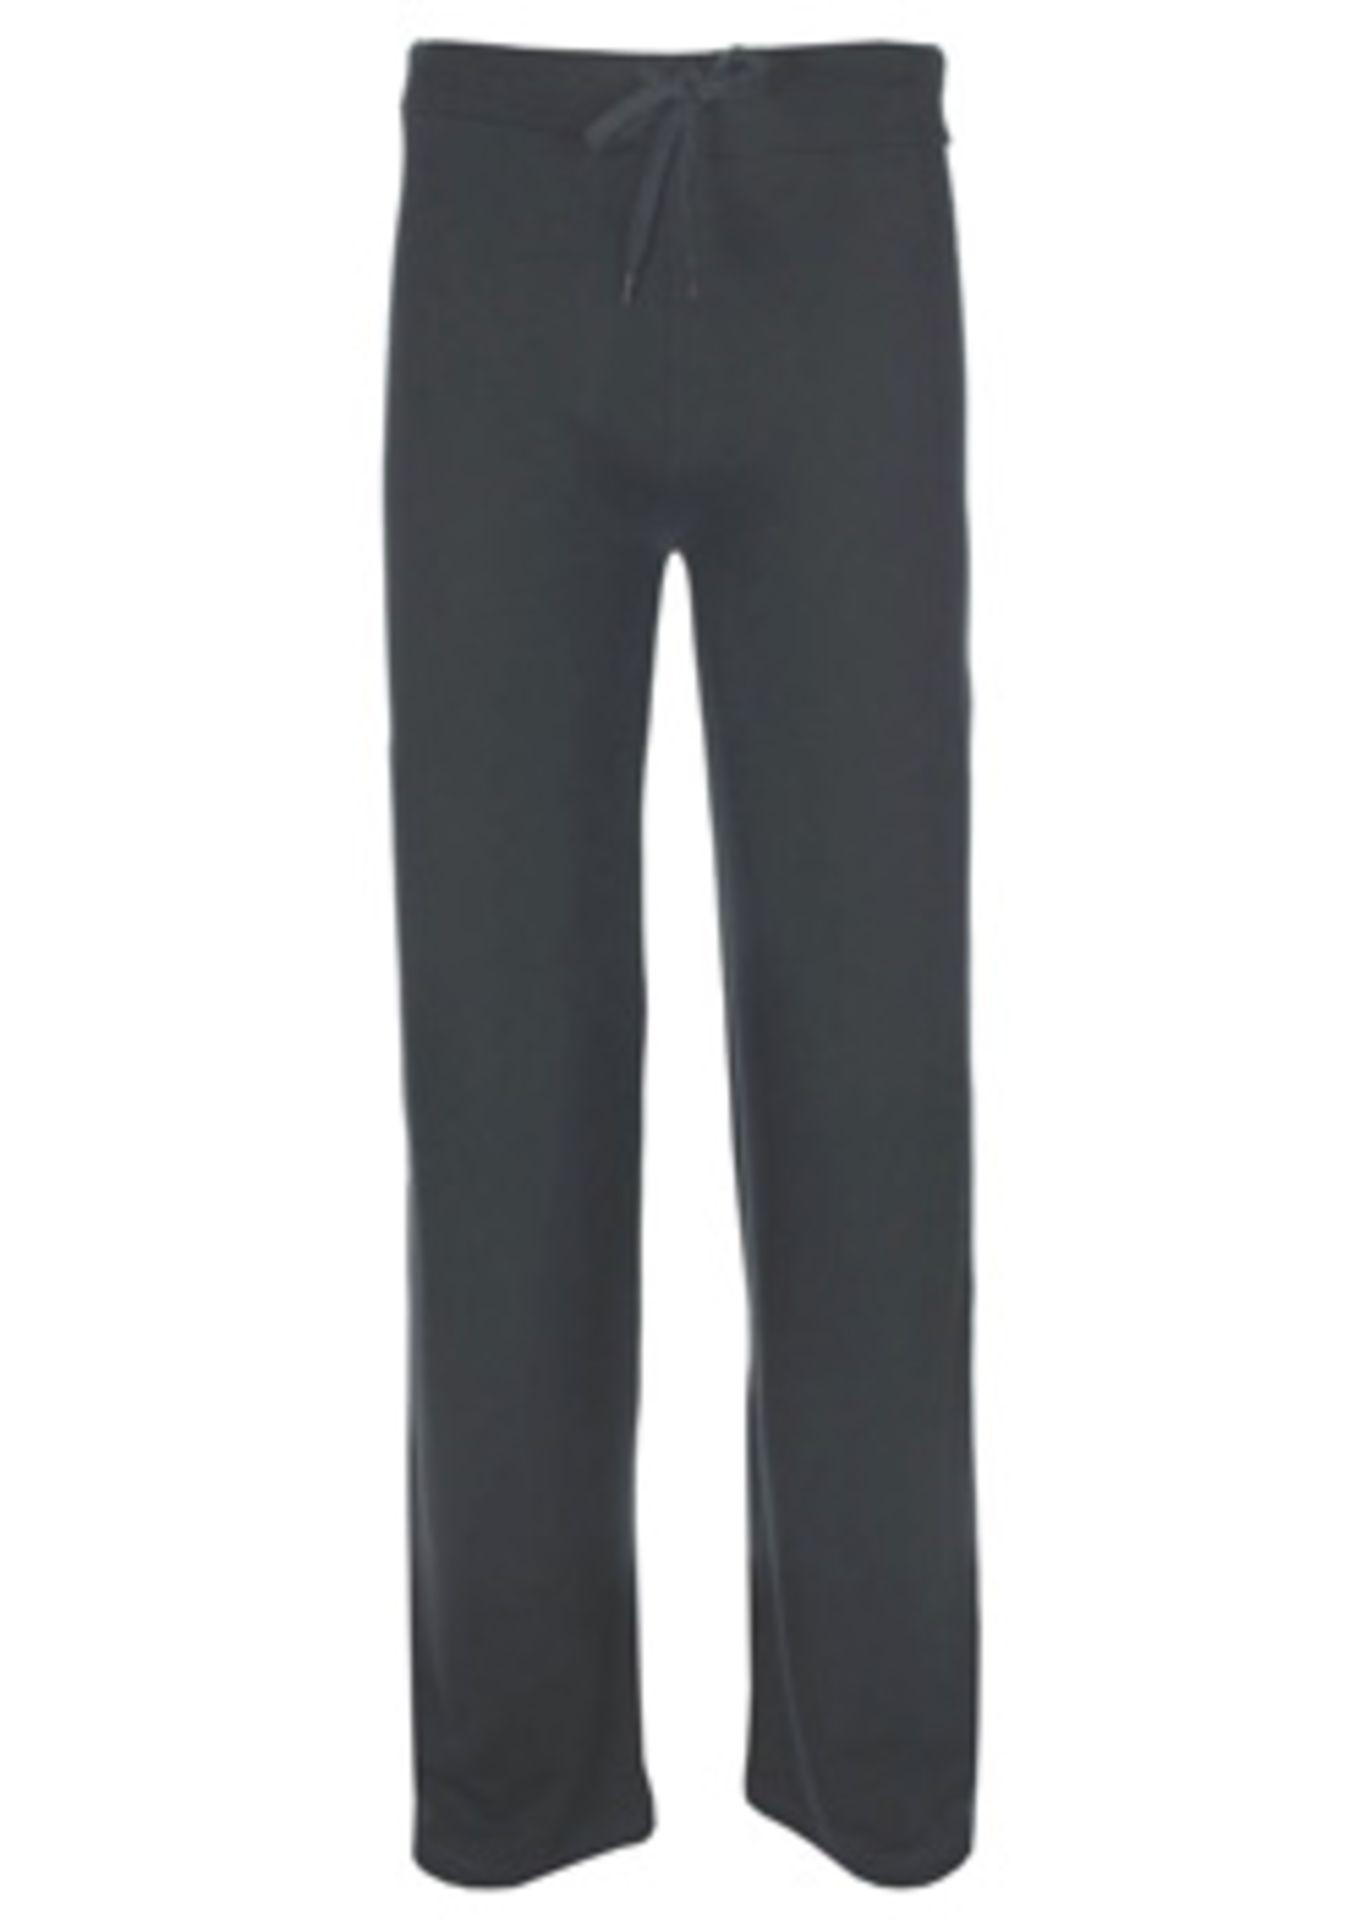 2 x Pairs Men's Yoga Pants | Large